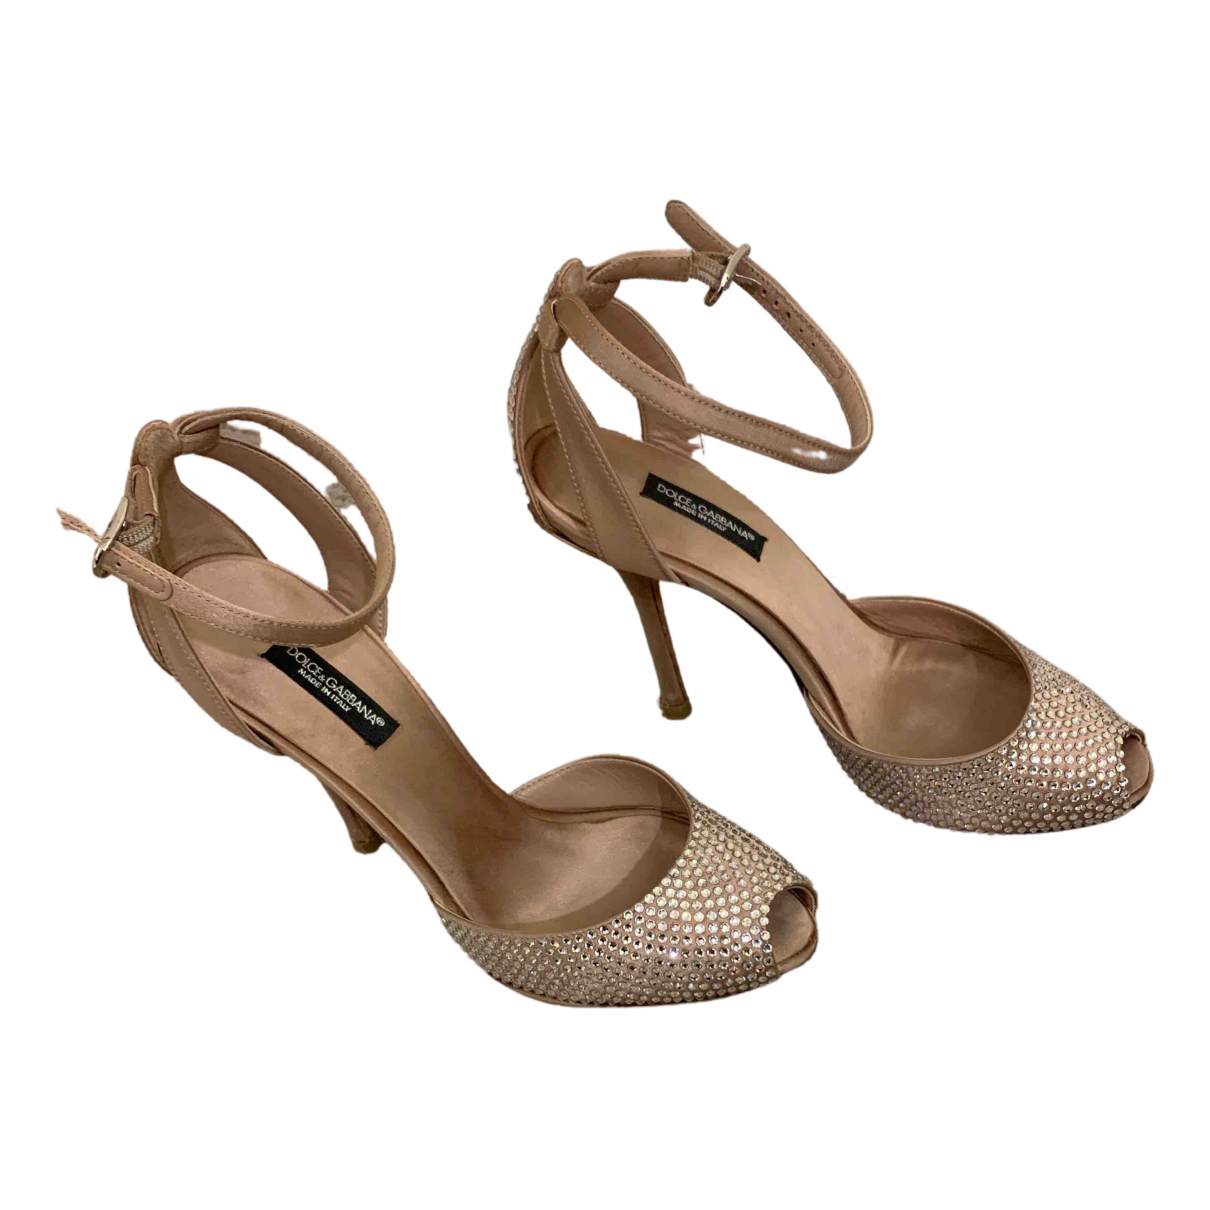 Dolce & Gabbana N Beige Glitter Heels for Women 36 EU